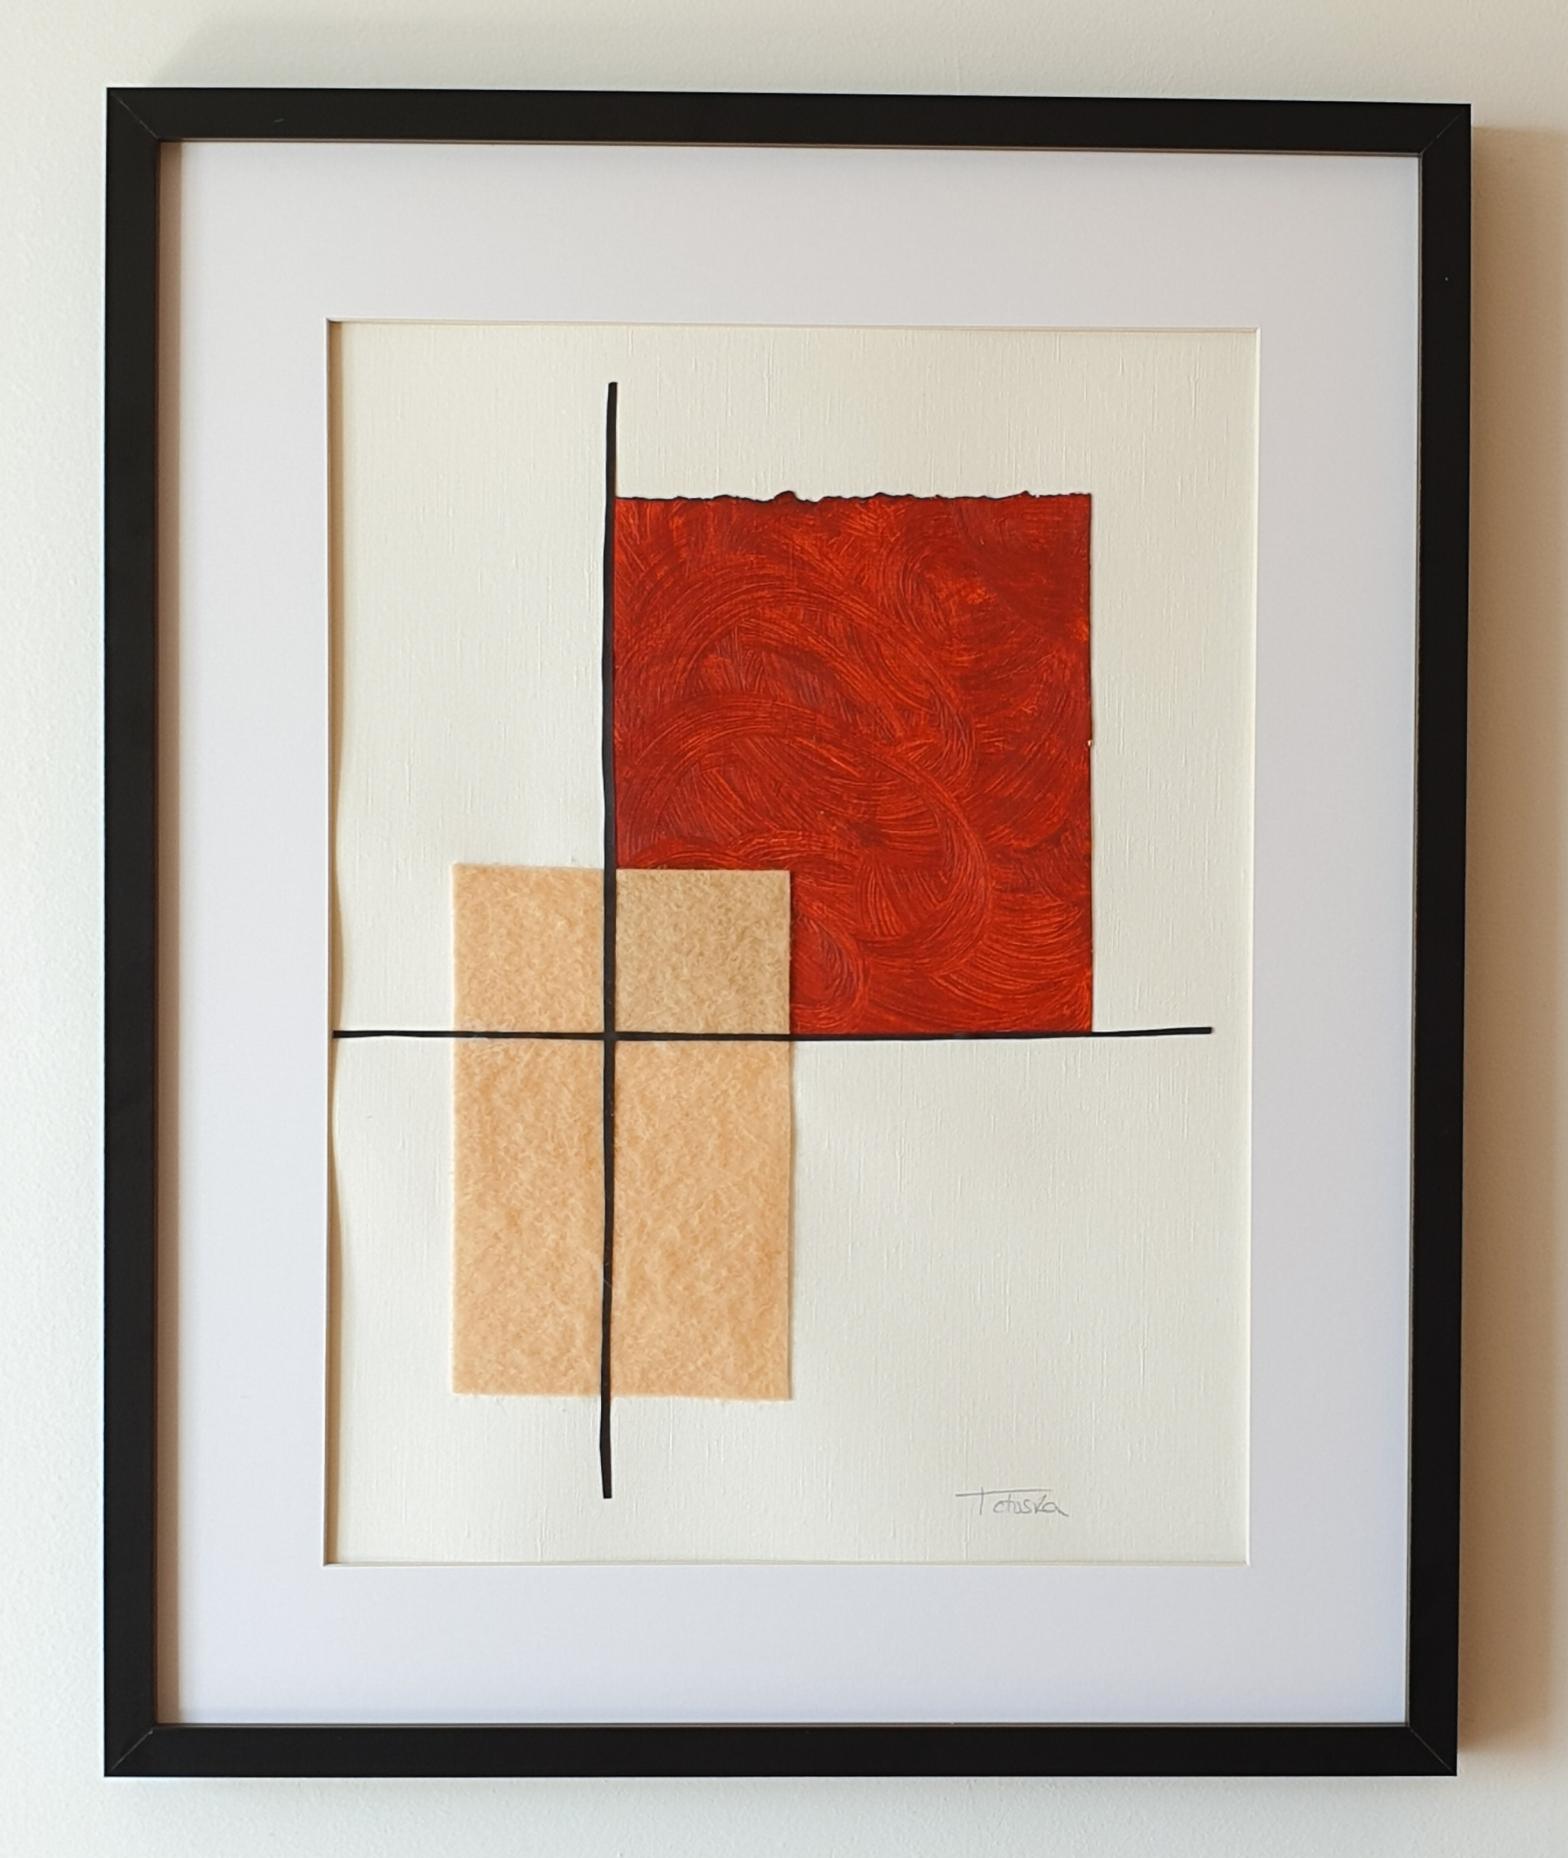 "Cuadro de arte abstracto titulado ""Prosperity"" de la artista Tatuska (https://artuska.com)"